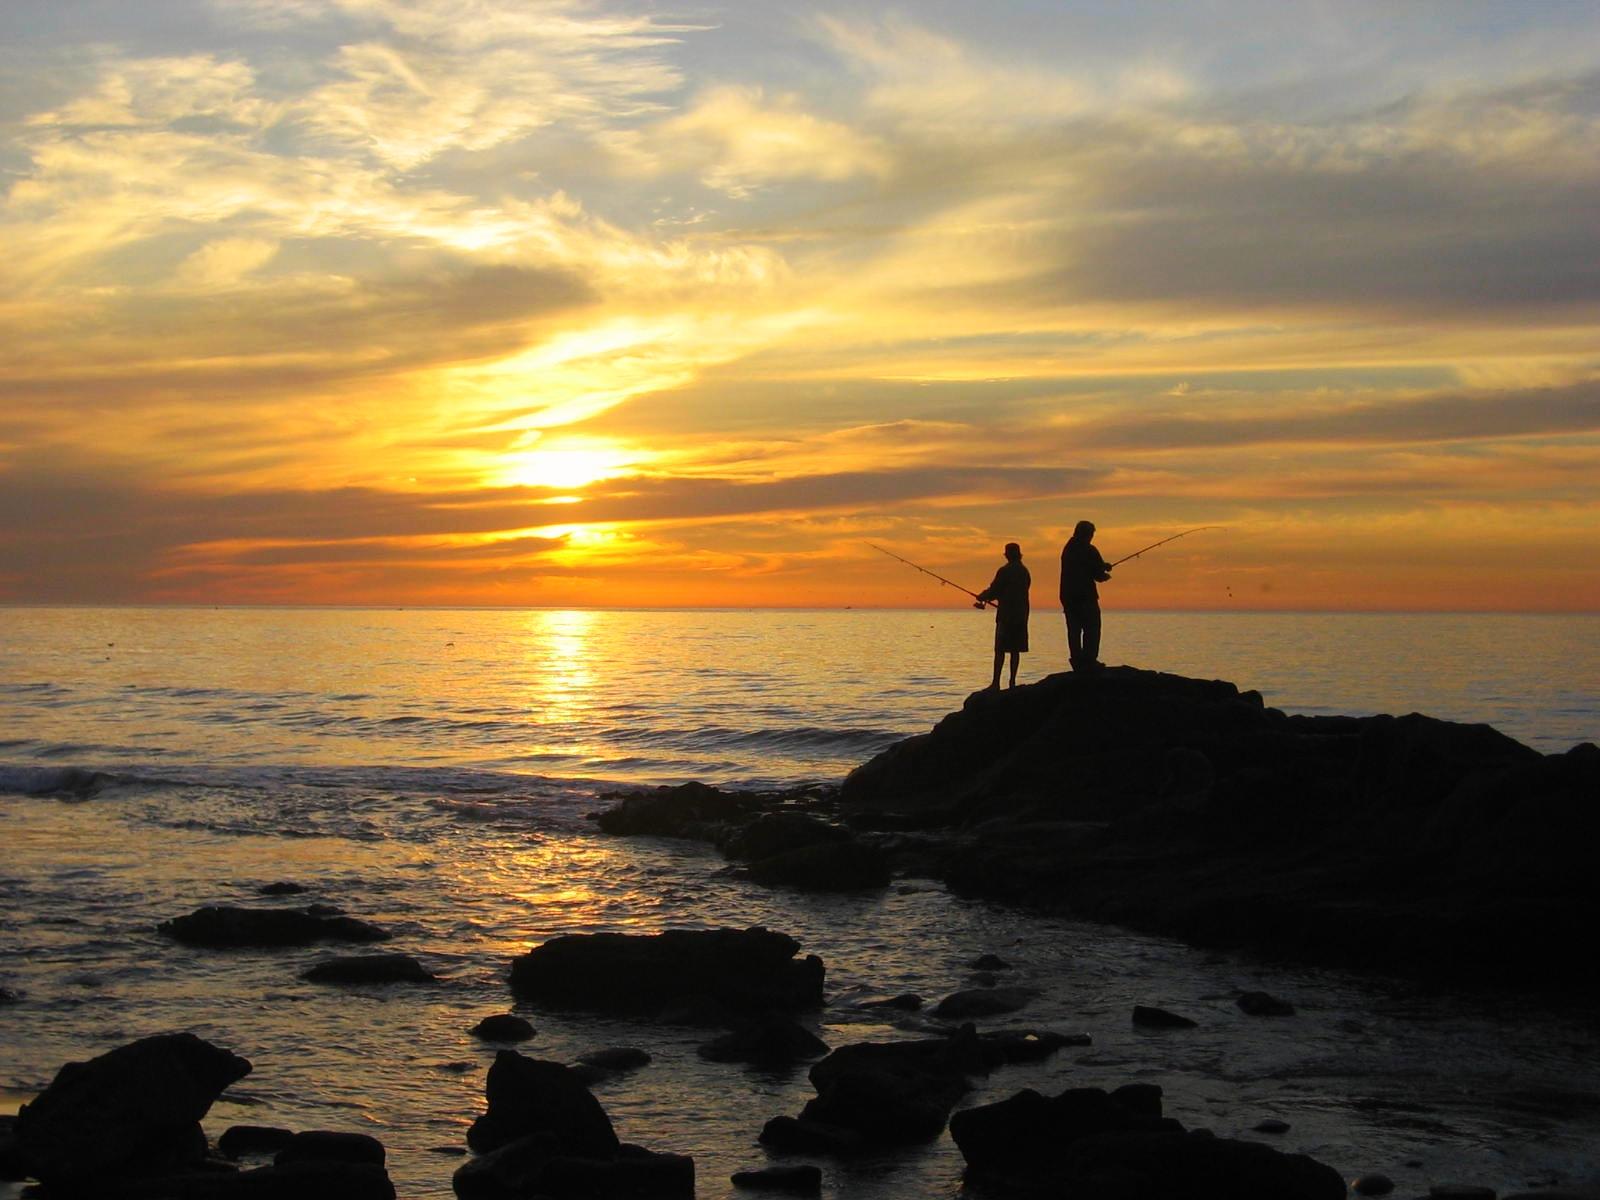 Wallpaper Sunset Fishing Peace Bliss Happiness Twilight